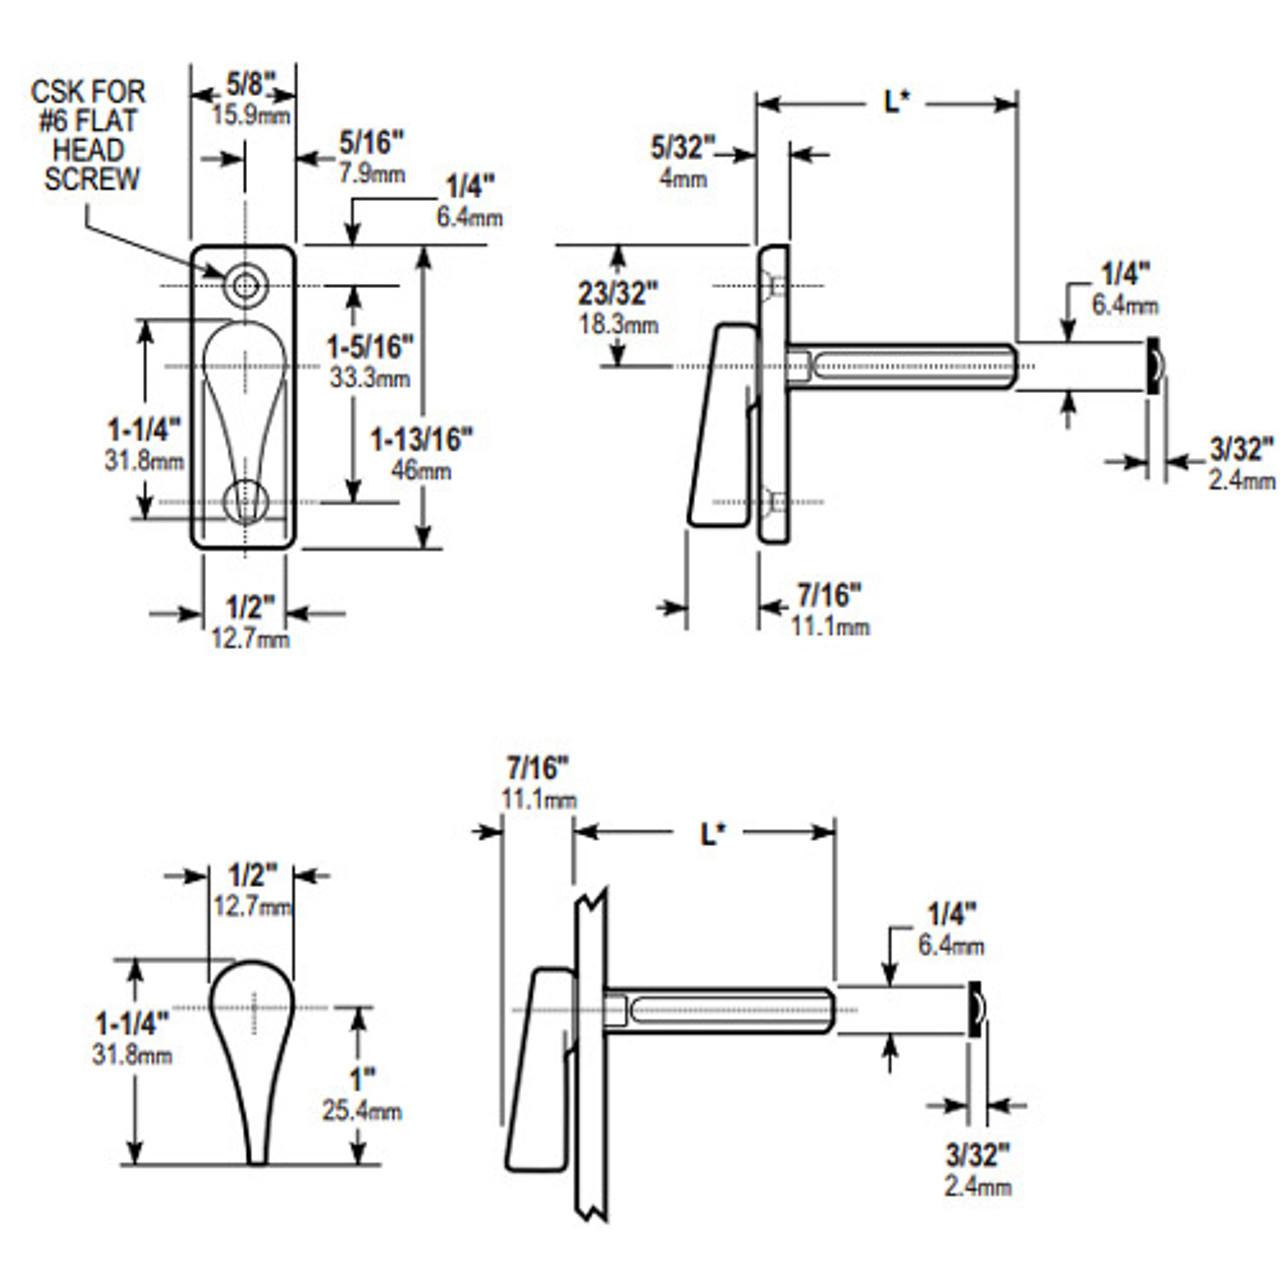 1000-11-18-121 Adams Rite 1000 Series Turns Dimensional View